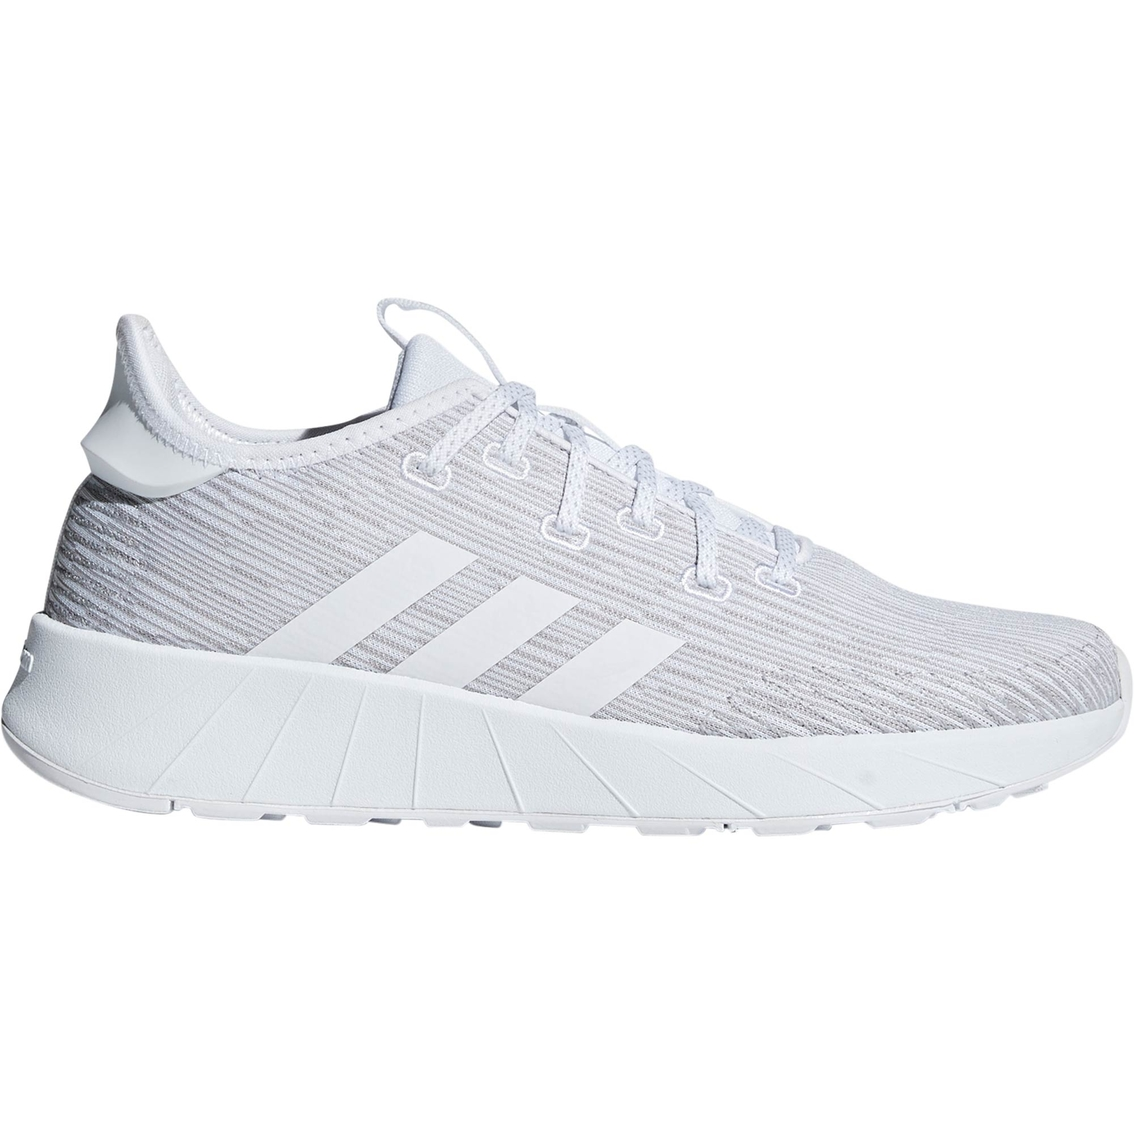 designer fashion super cheap sale Adidas Women's Questar X Byd Sneakers | Shorts | Apparel ...